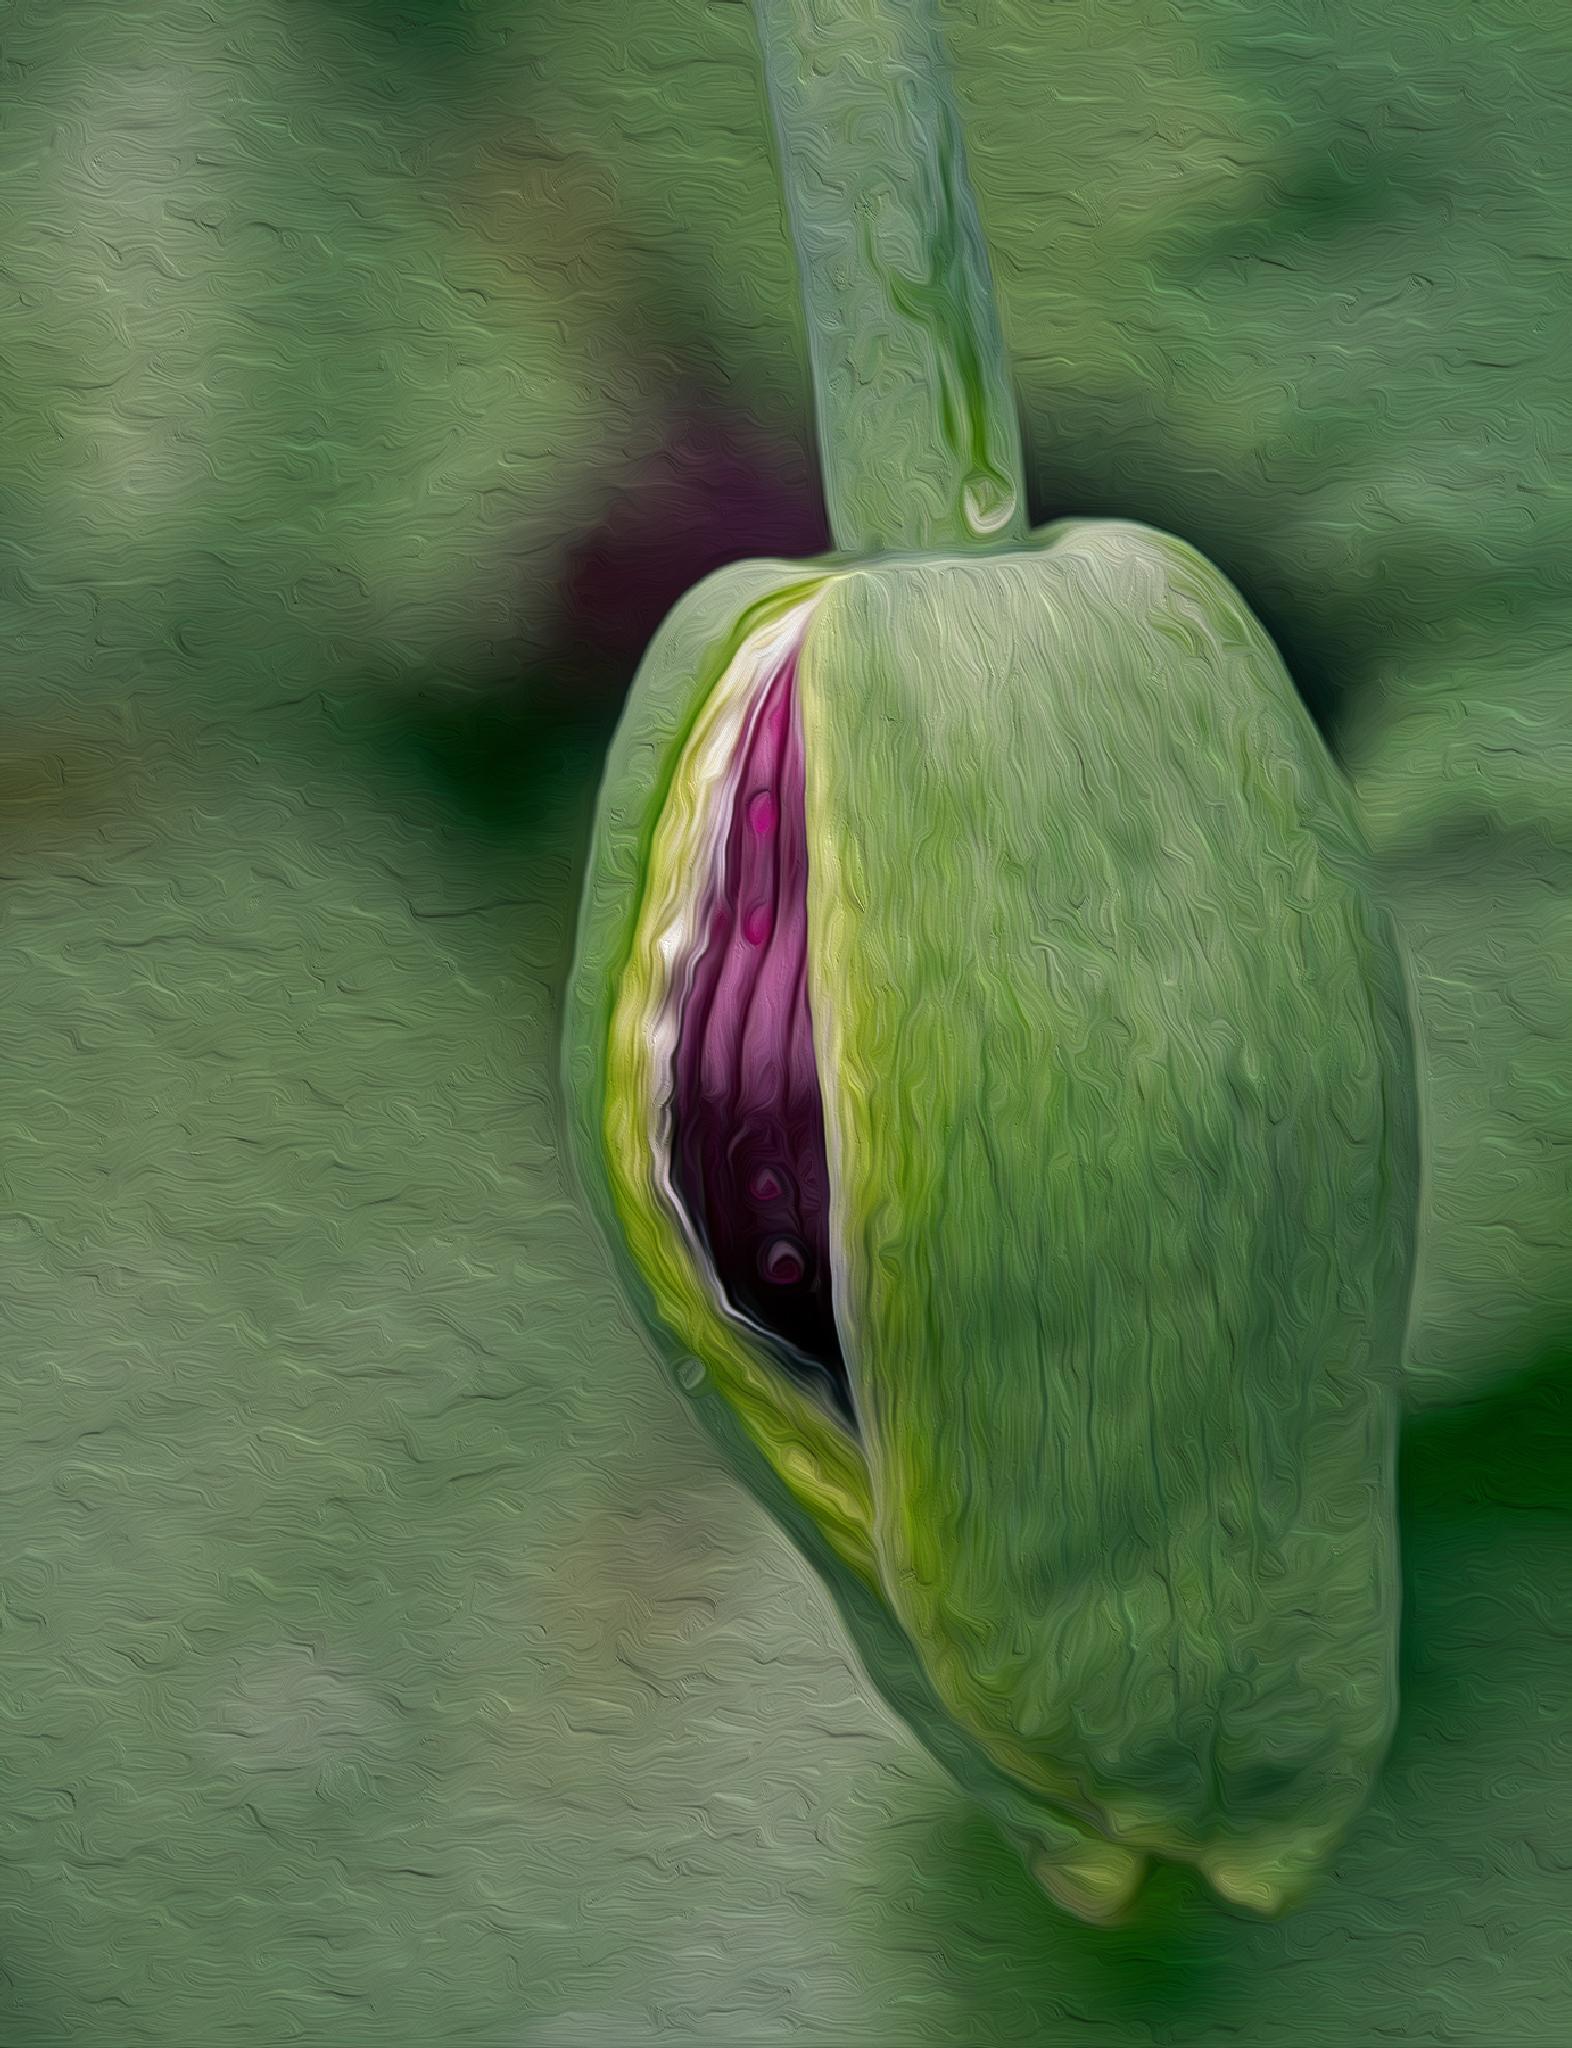 poppy in disguise by Birthe Kirk Gawinski